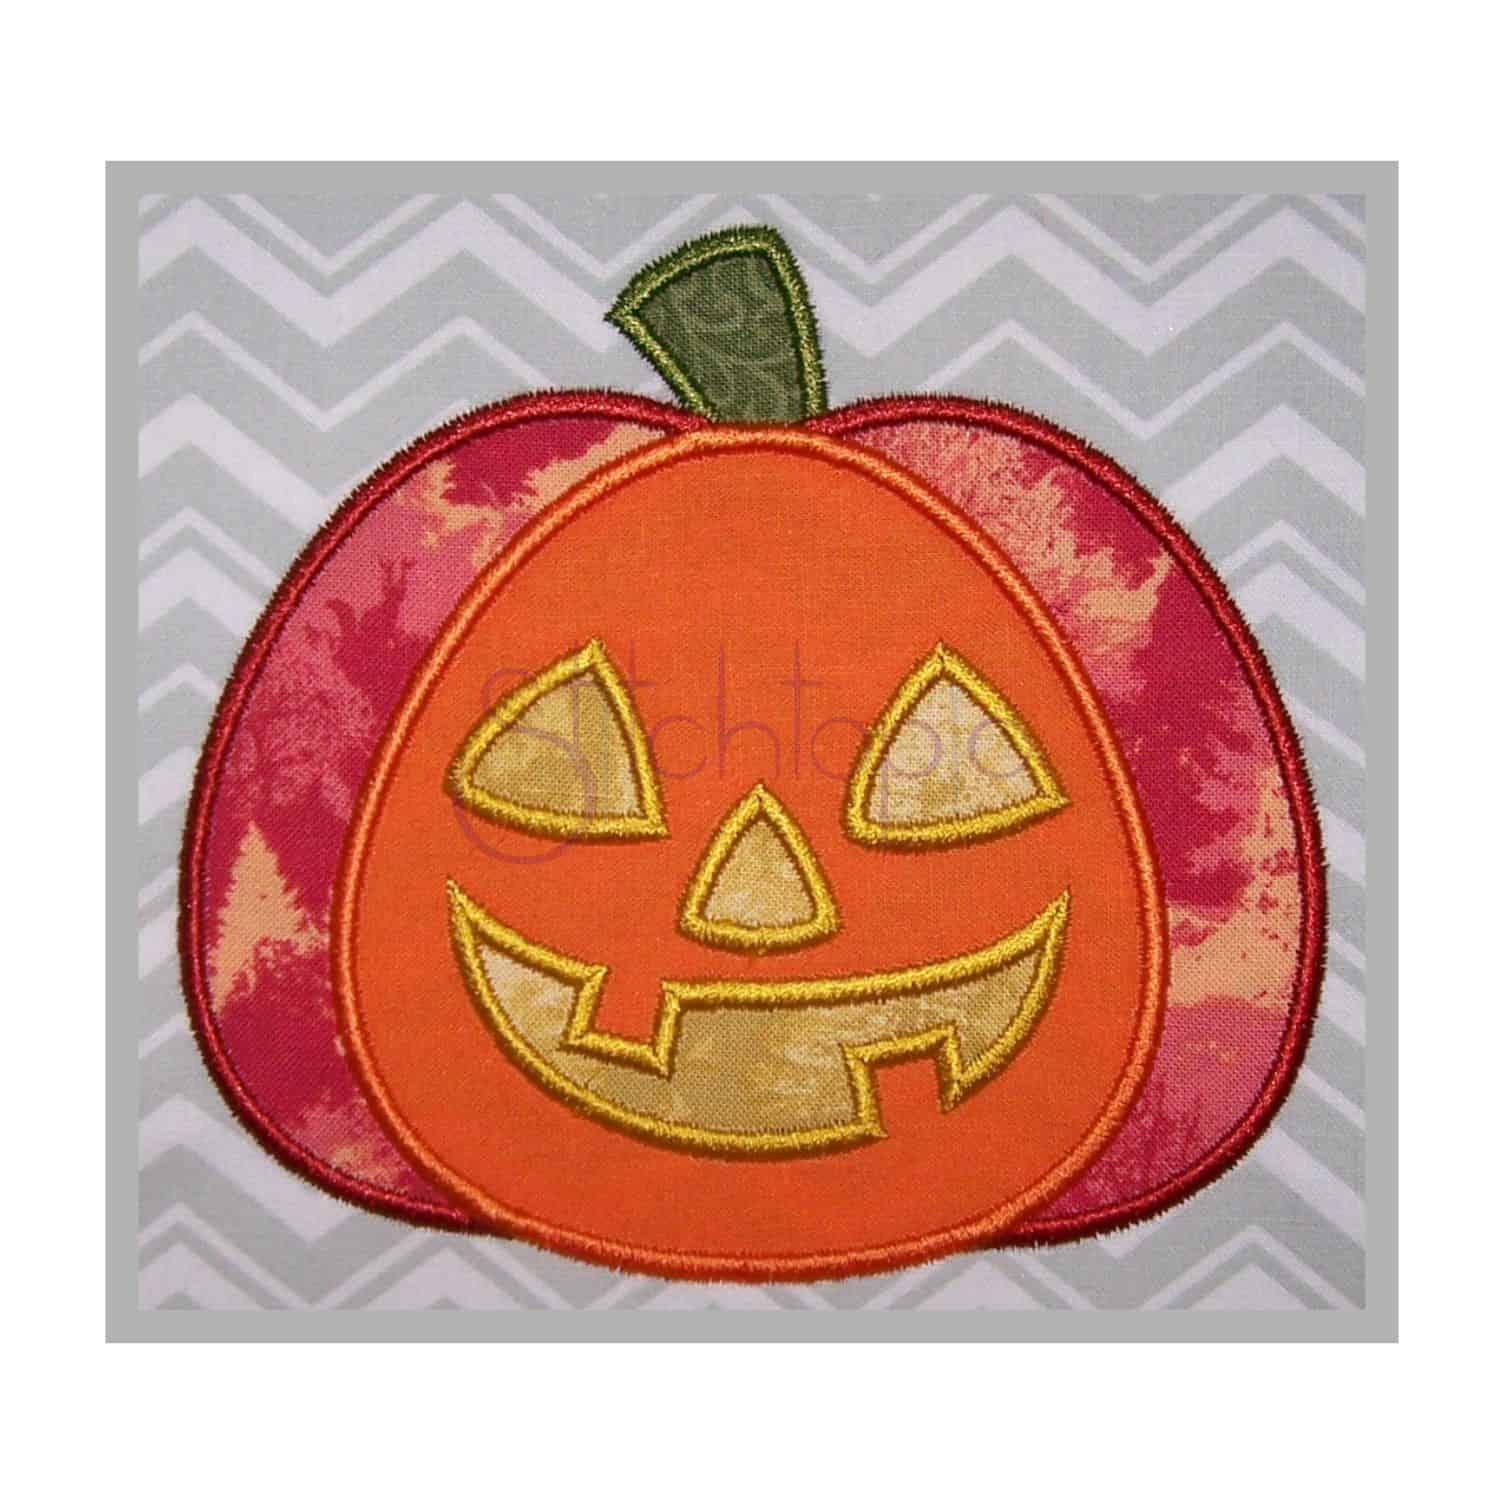 Halloween jack o 39 lantern applique design stitchtopia for Appliques design